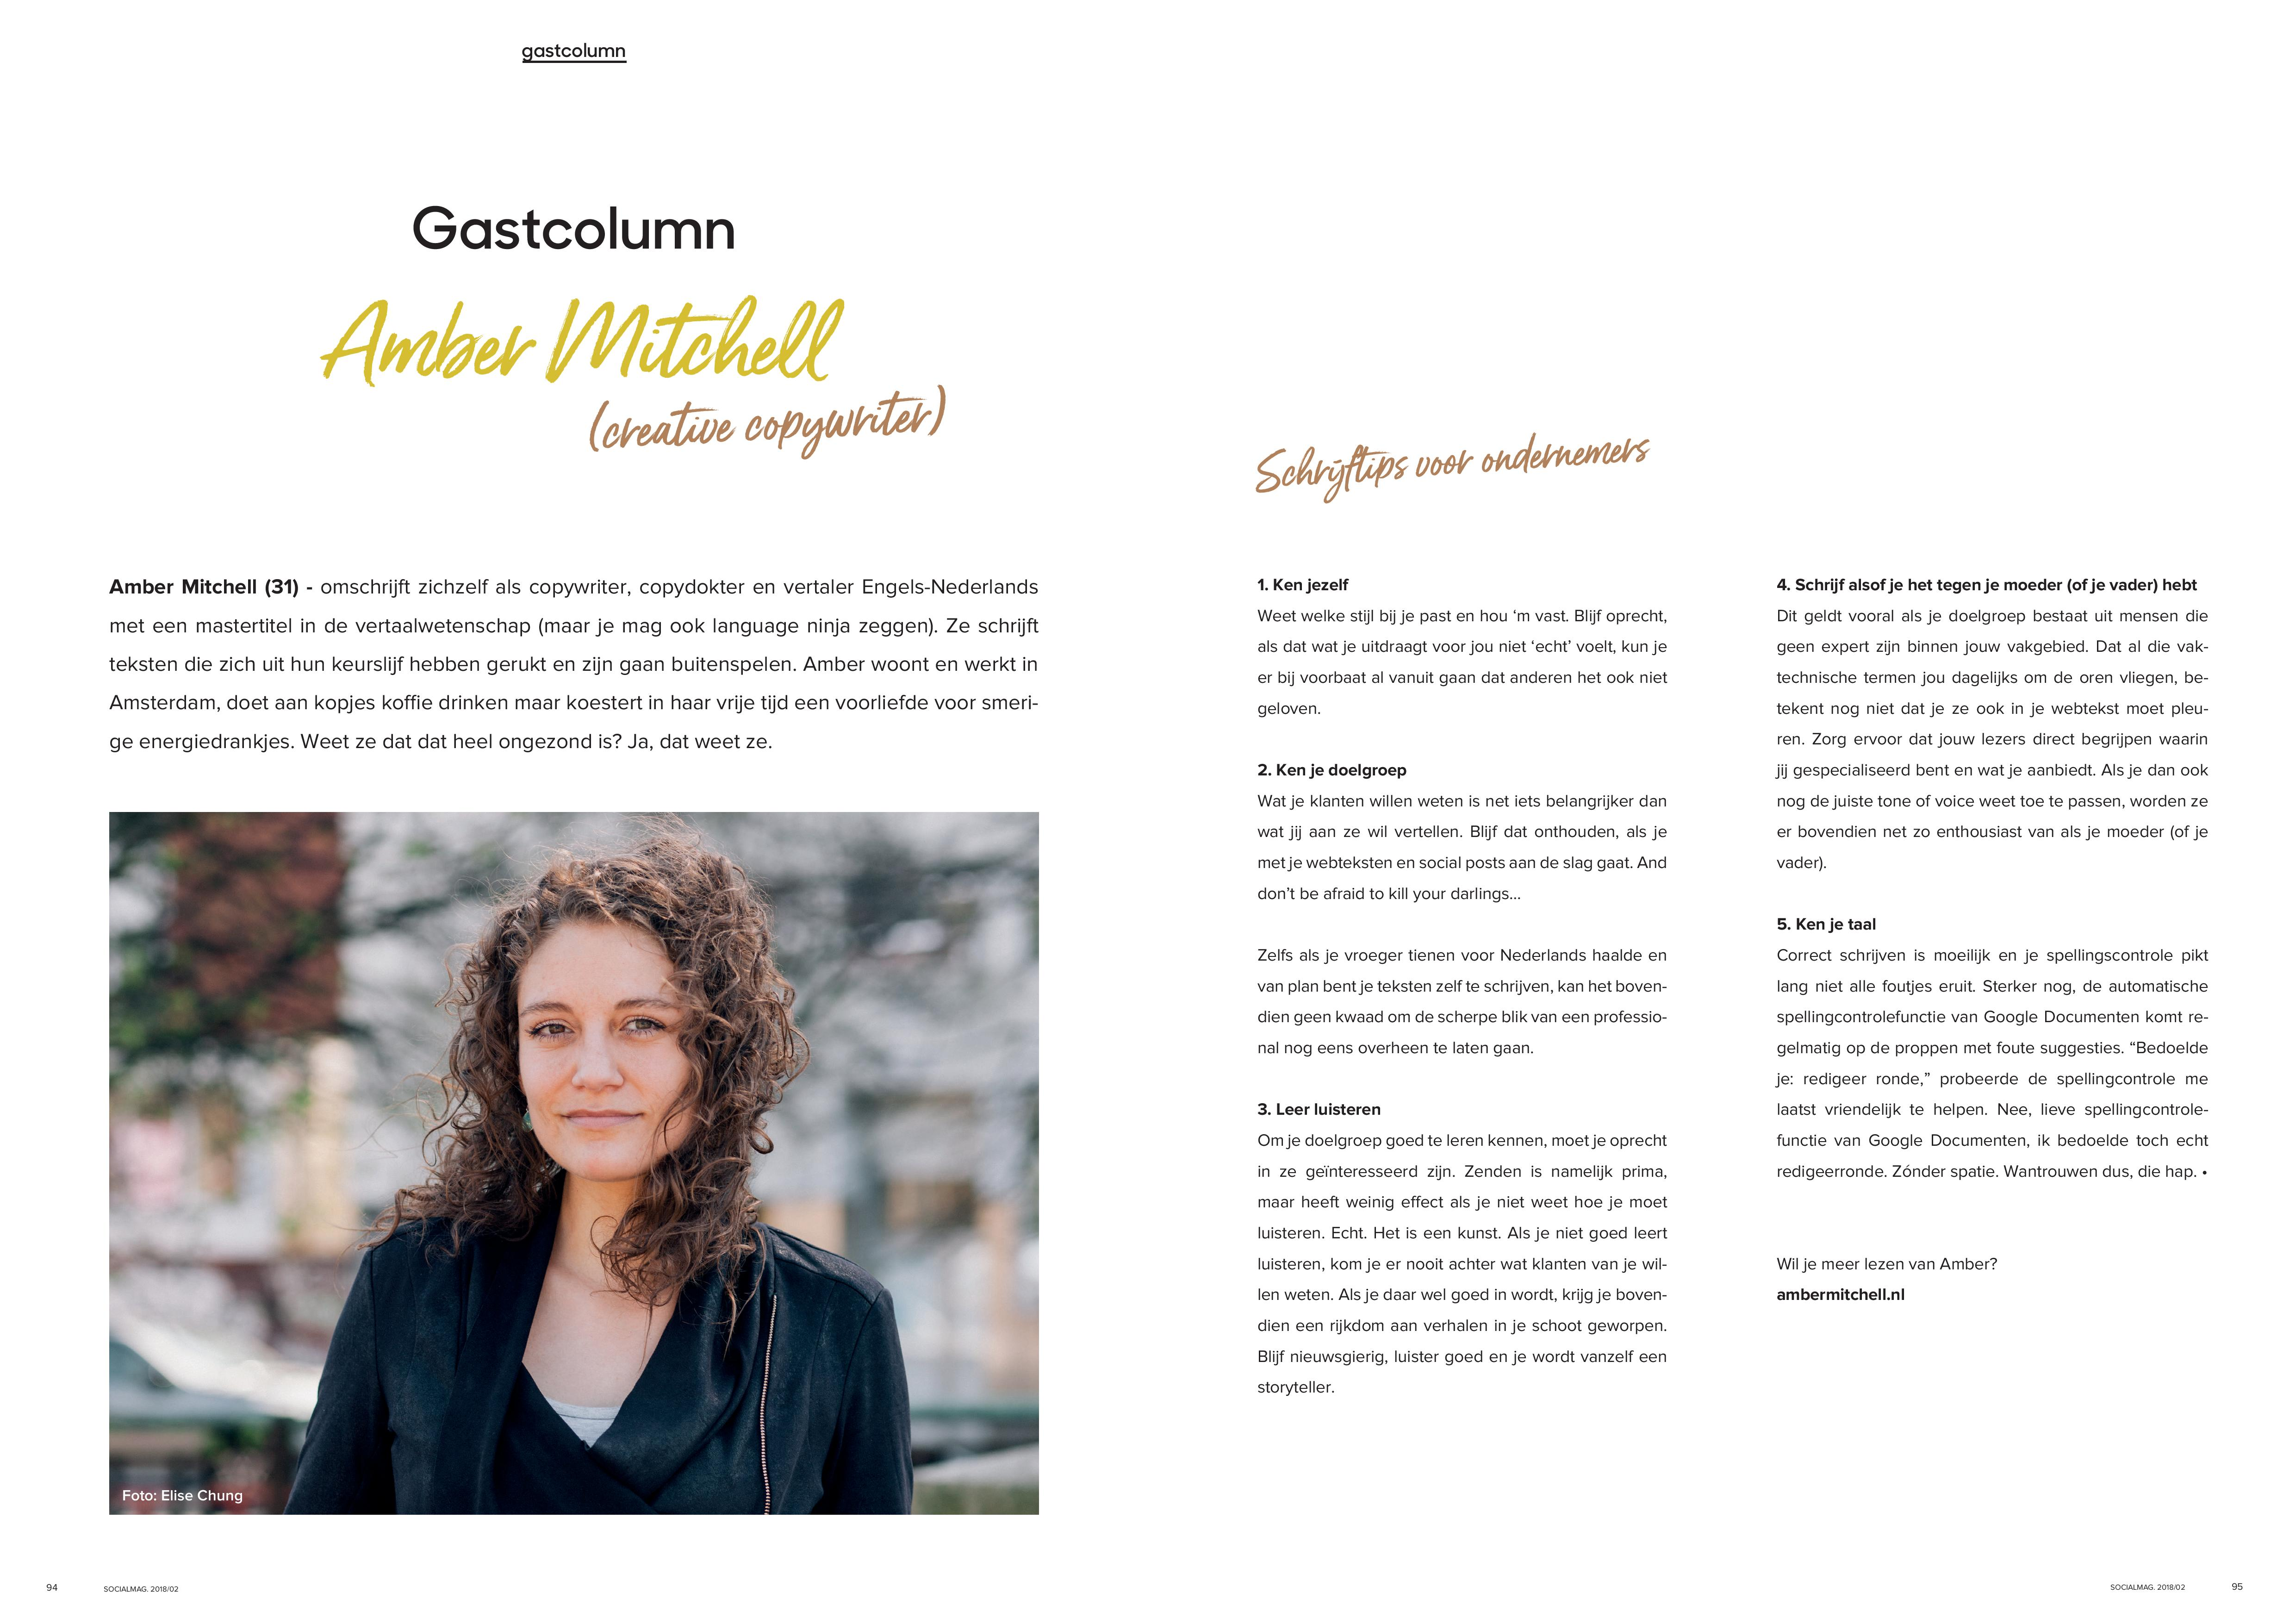 amber-mitchell-gastcolumn-artikel-socialmag2